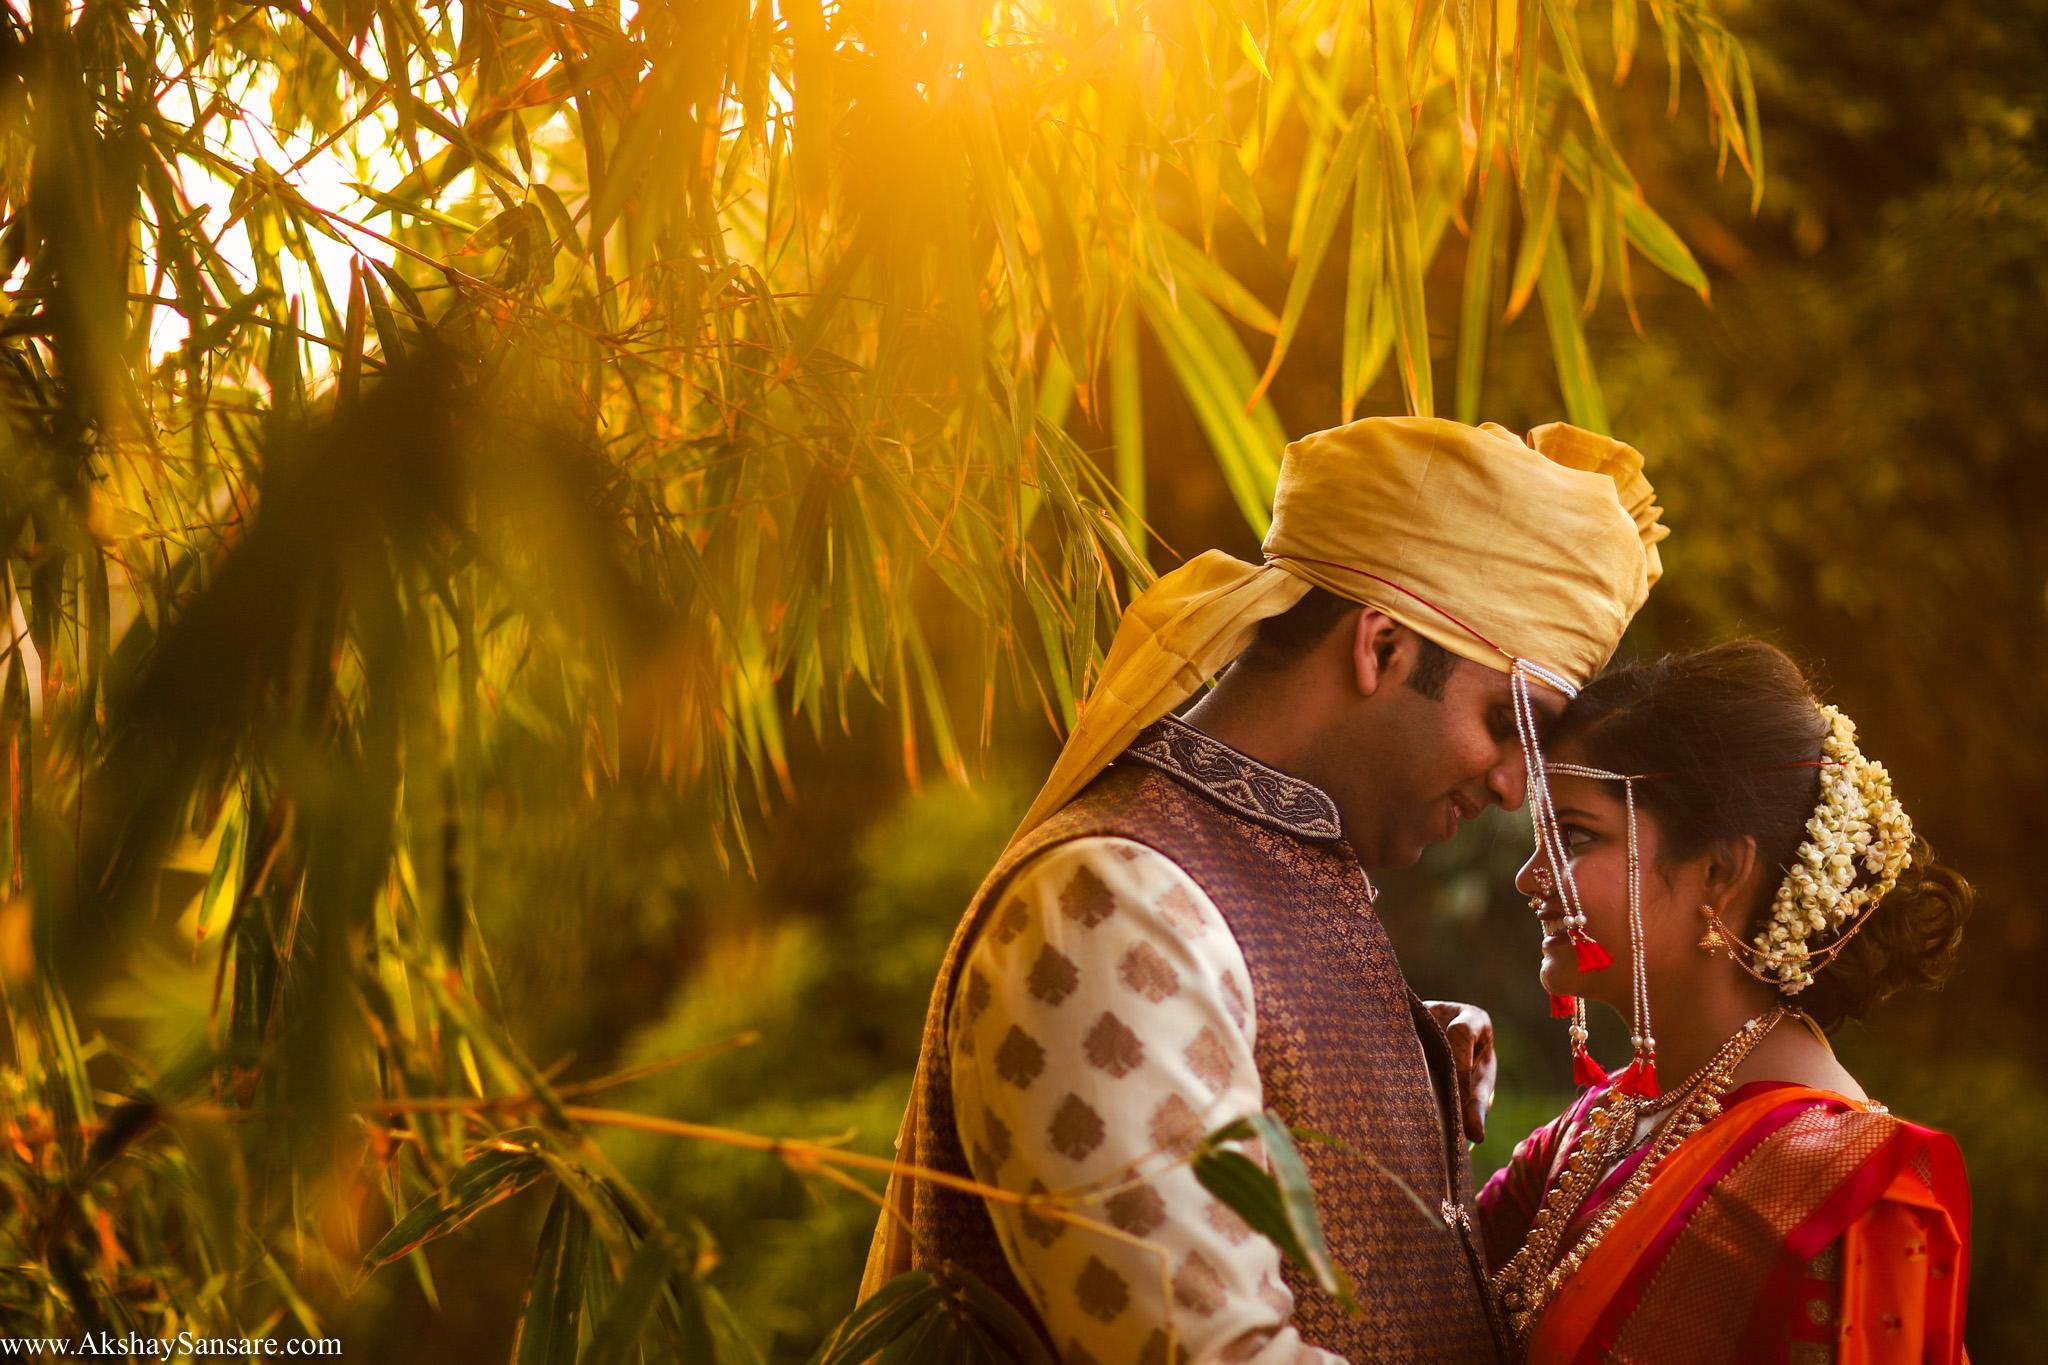 Salil x Kimaya Akshay Sansare Photography Candid wedding Photographer in mumbai best(39).jpg